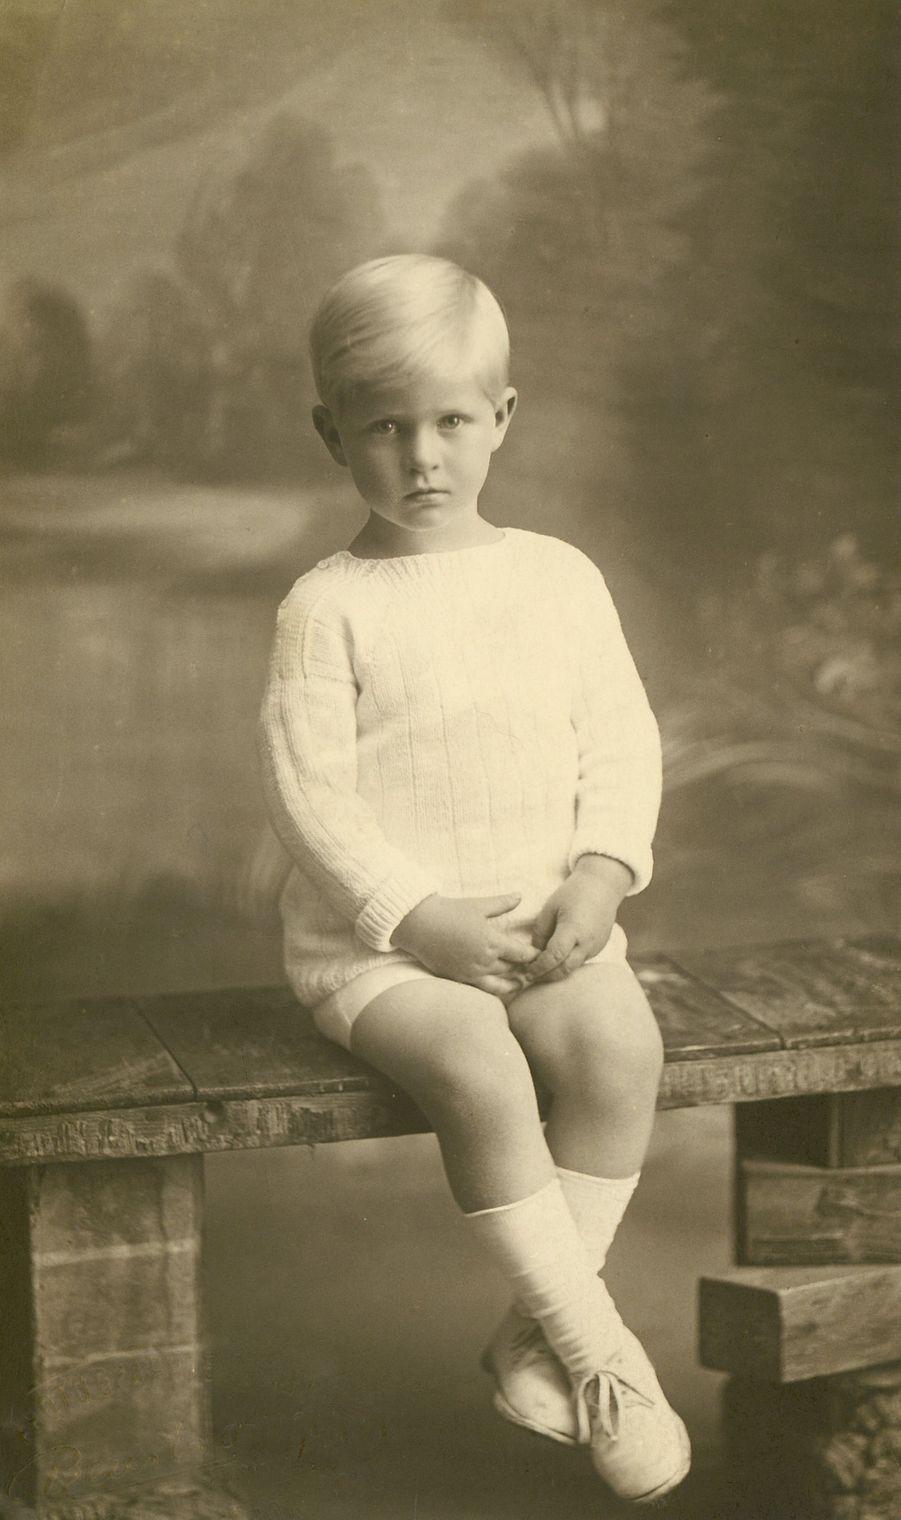 Le prince Philip, vers 1927